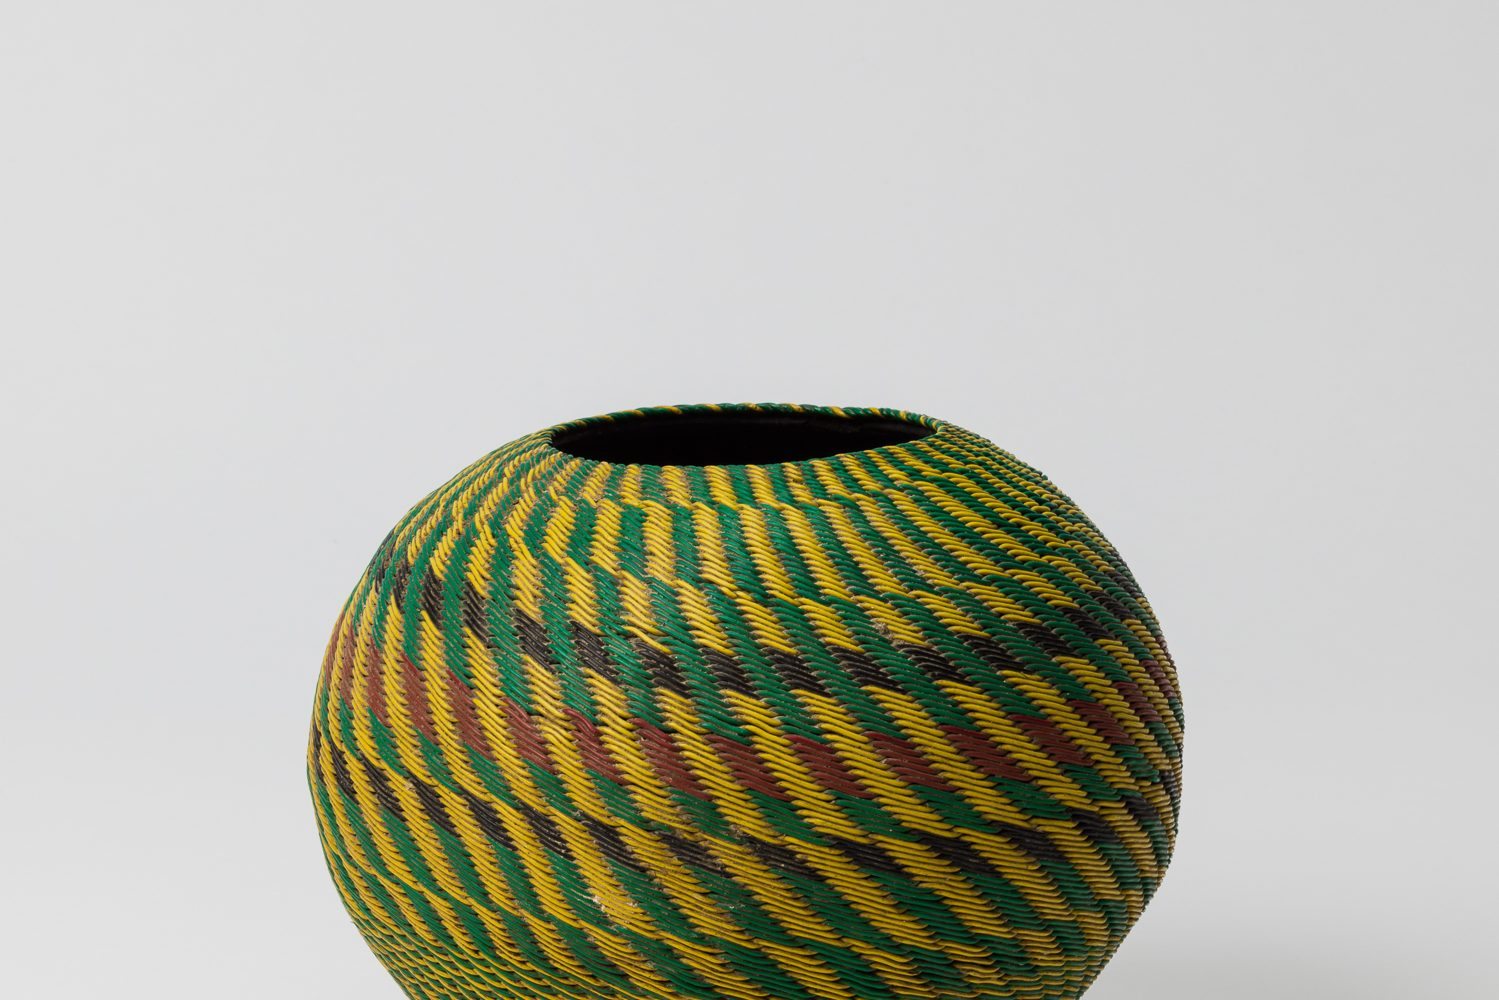 Biergefäß (ukhamba), Zulu Kultur, Südafrika, 20. Jahrhundert